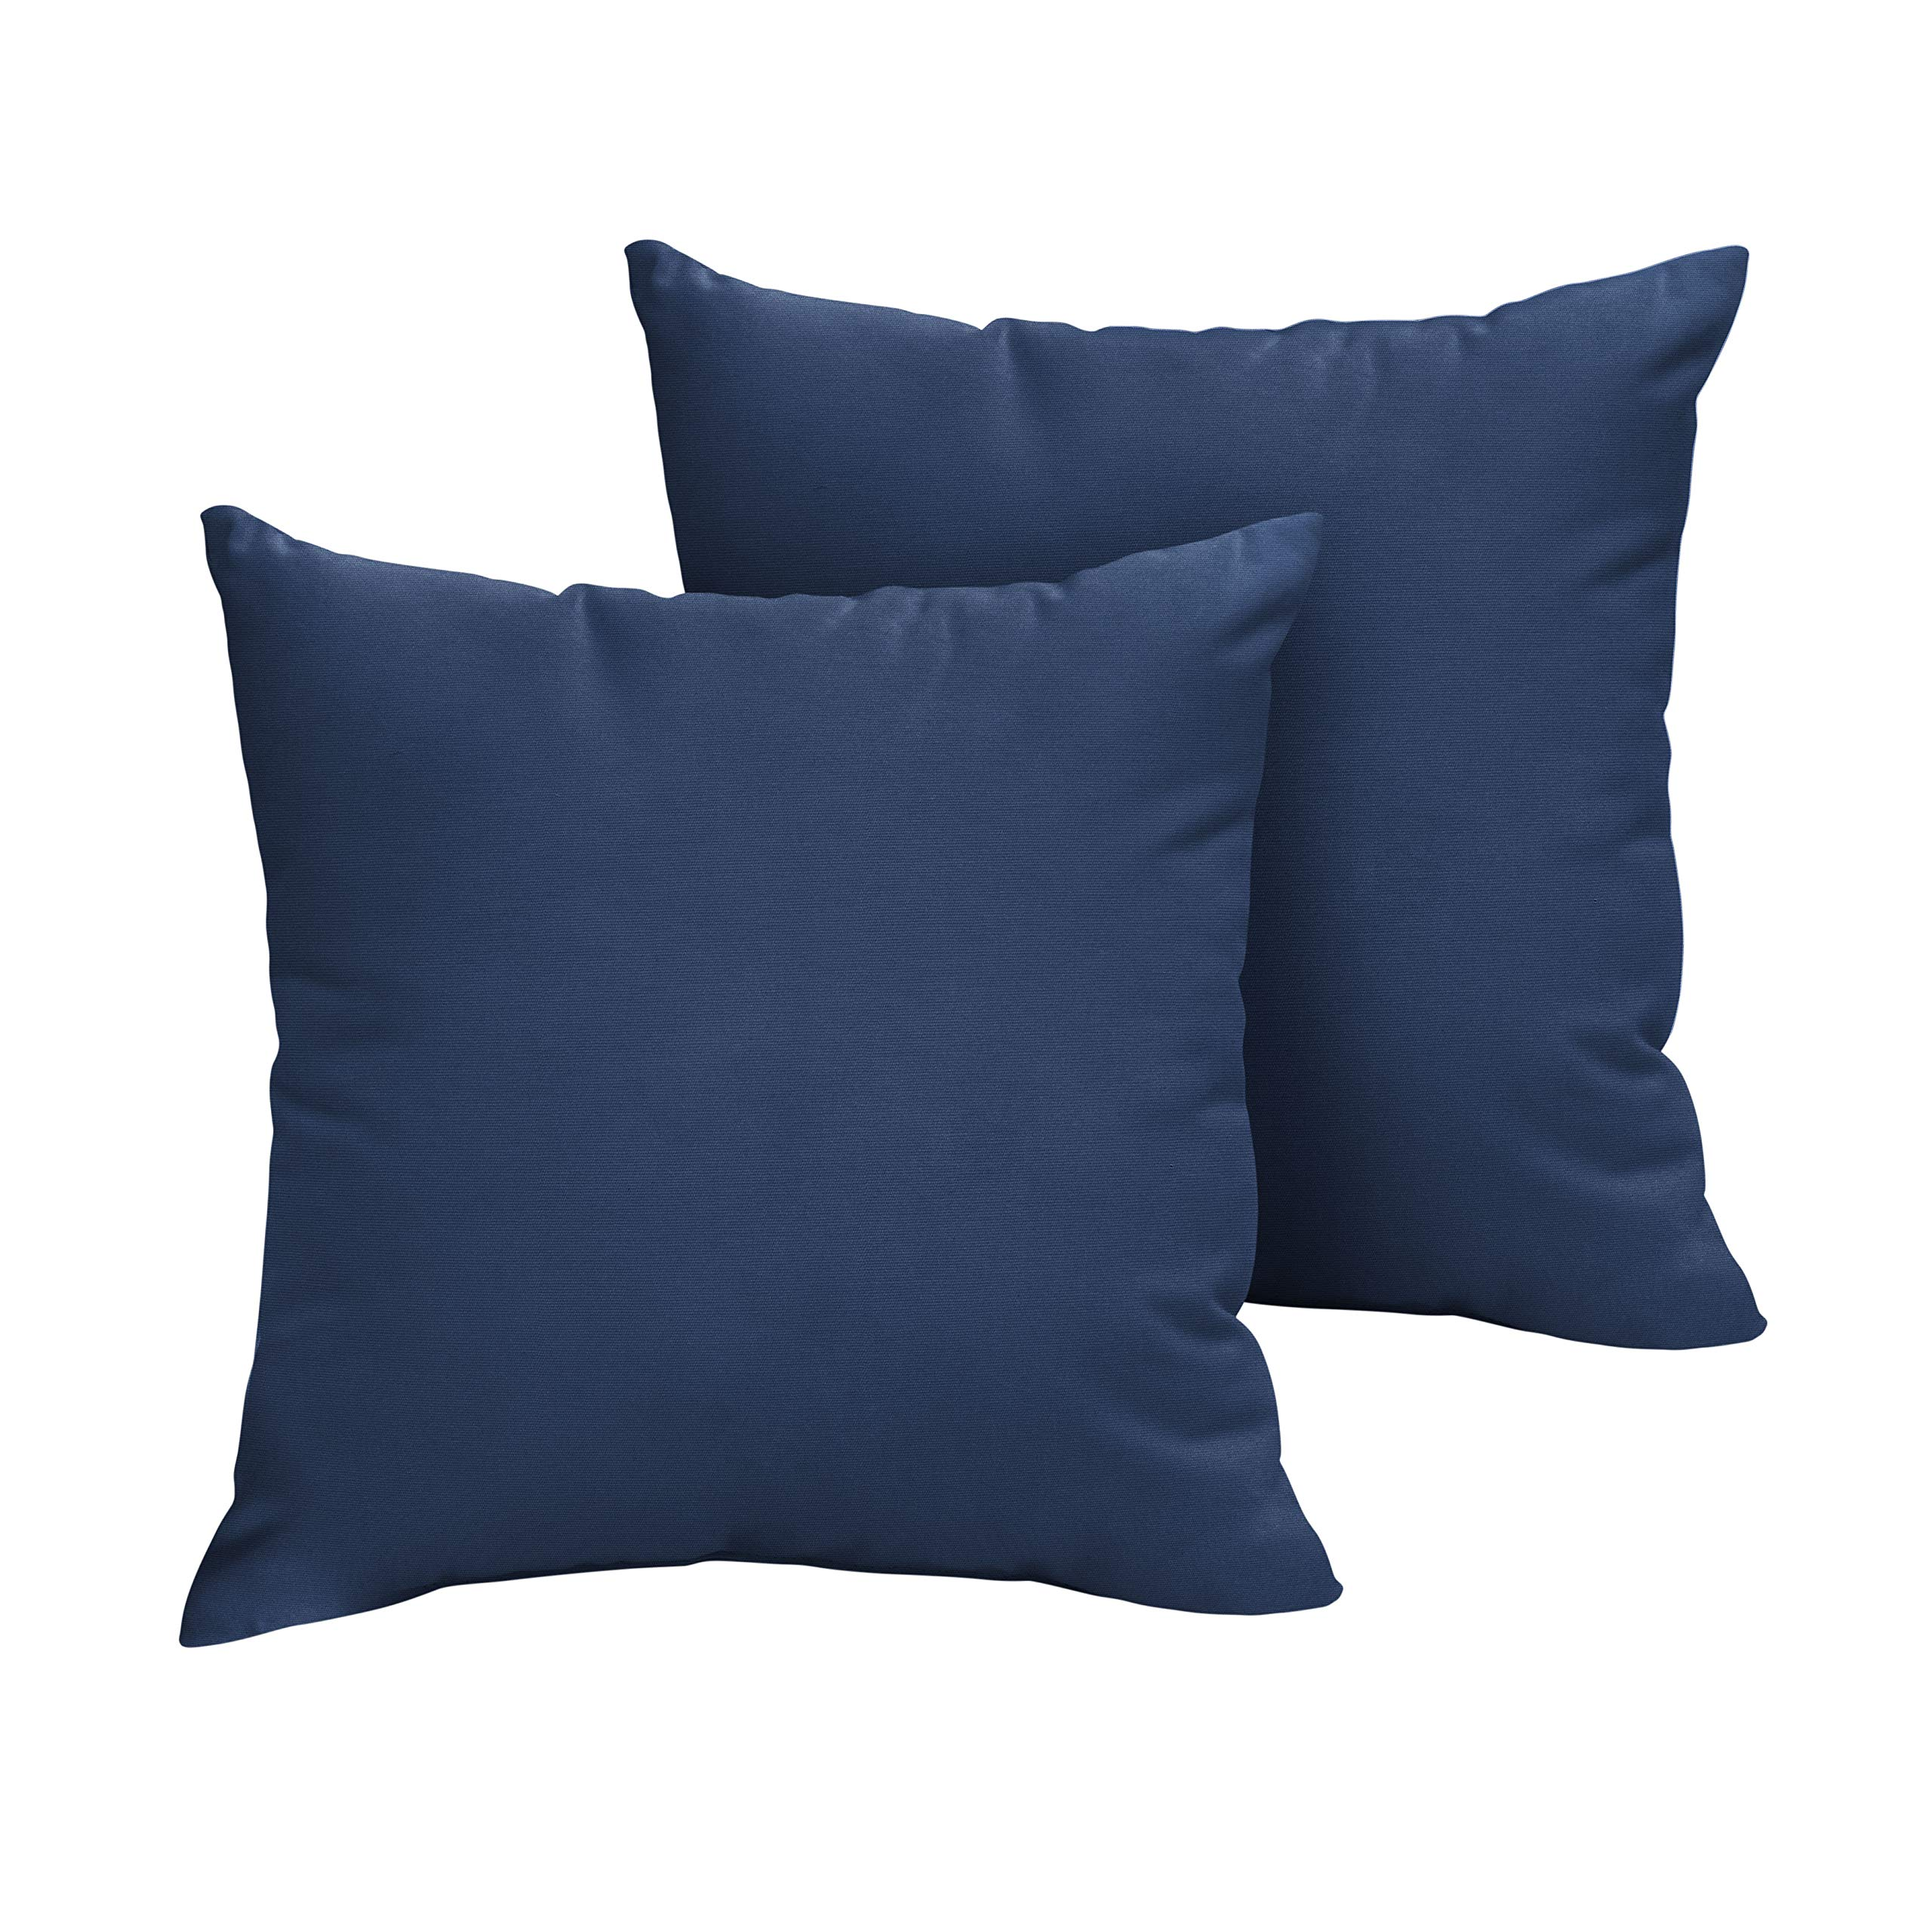 1101Design Sunbrella Canvas Navy Knife Edge Decorative Indoor/Outdoor Square Throw Pillows, Perfect for Patio Décor - Canvas Navy Blue 20'' (Set of 2)